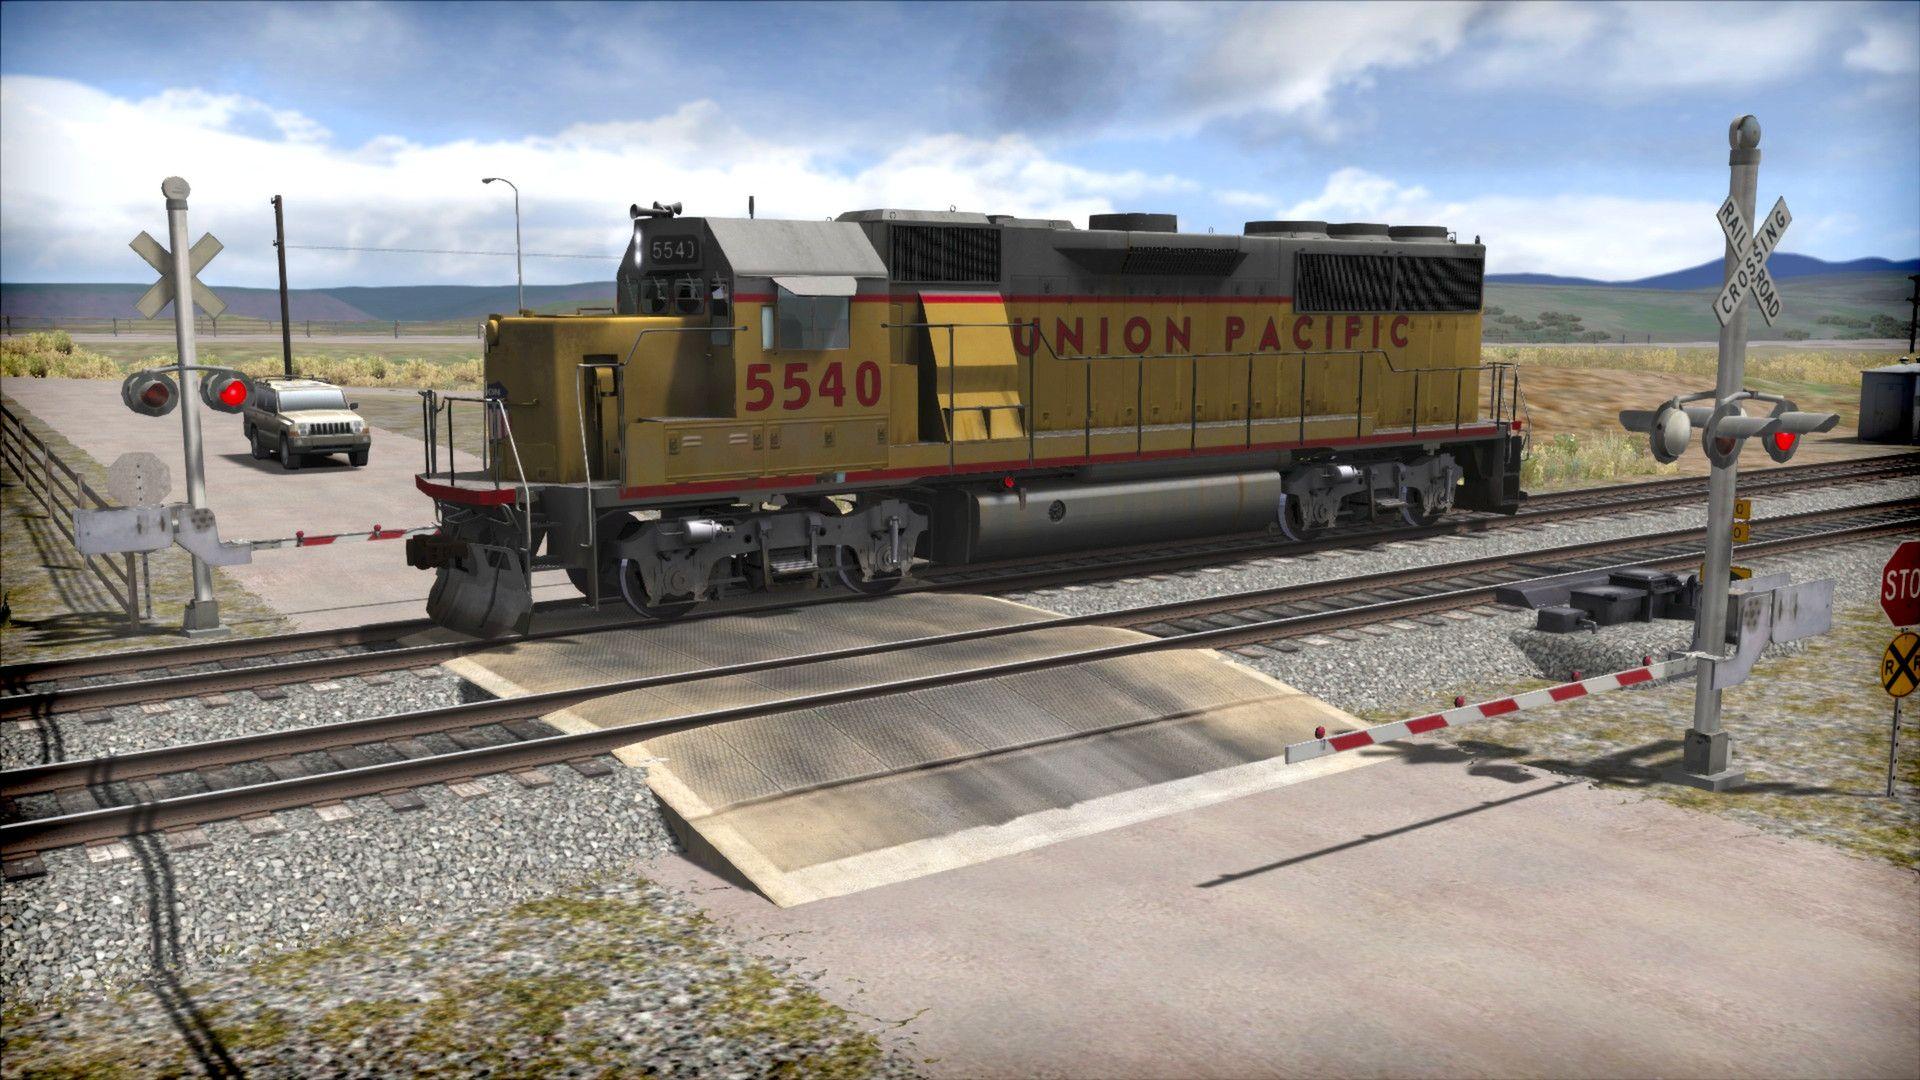 UPGP505